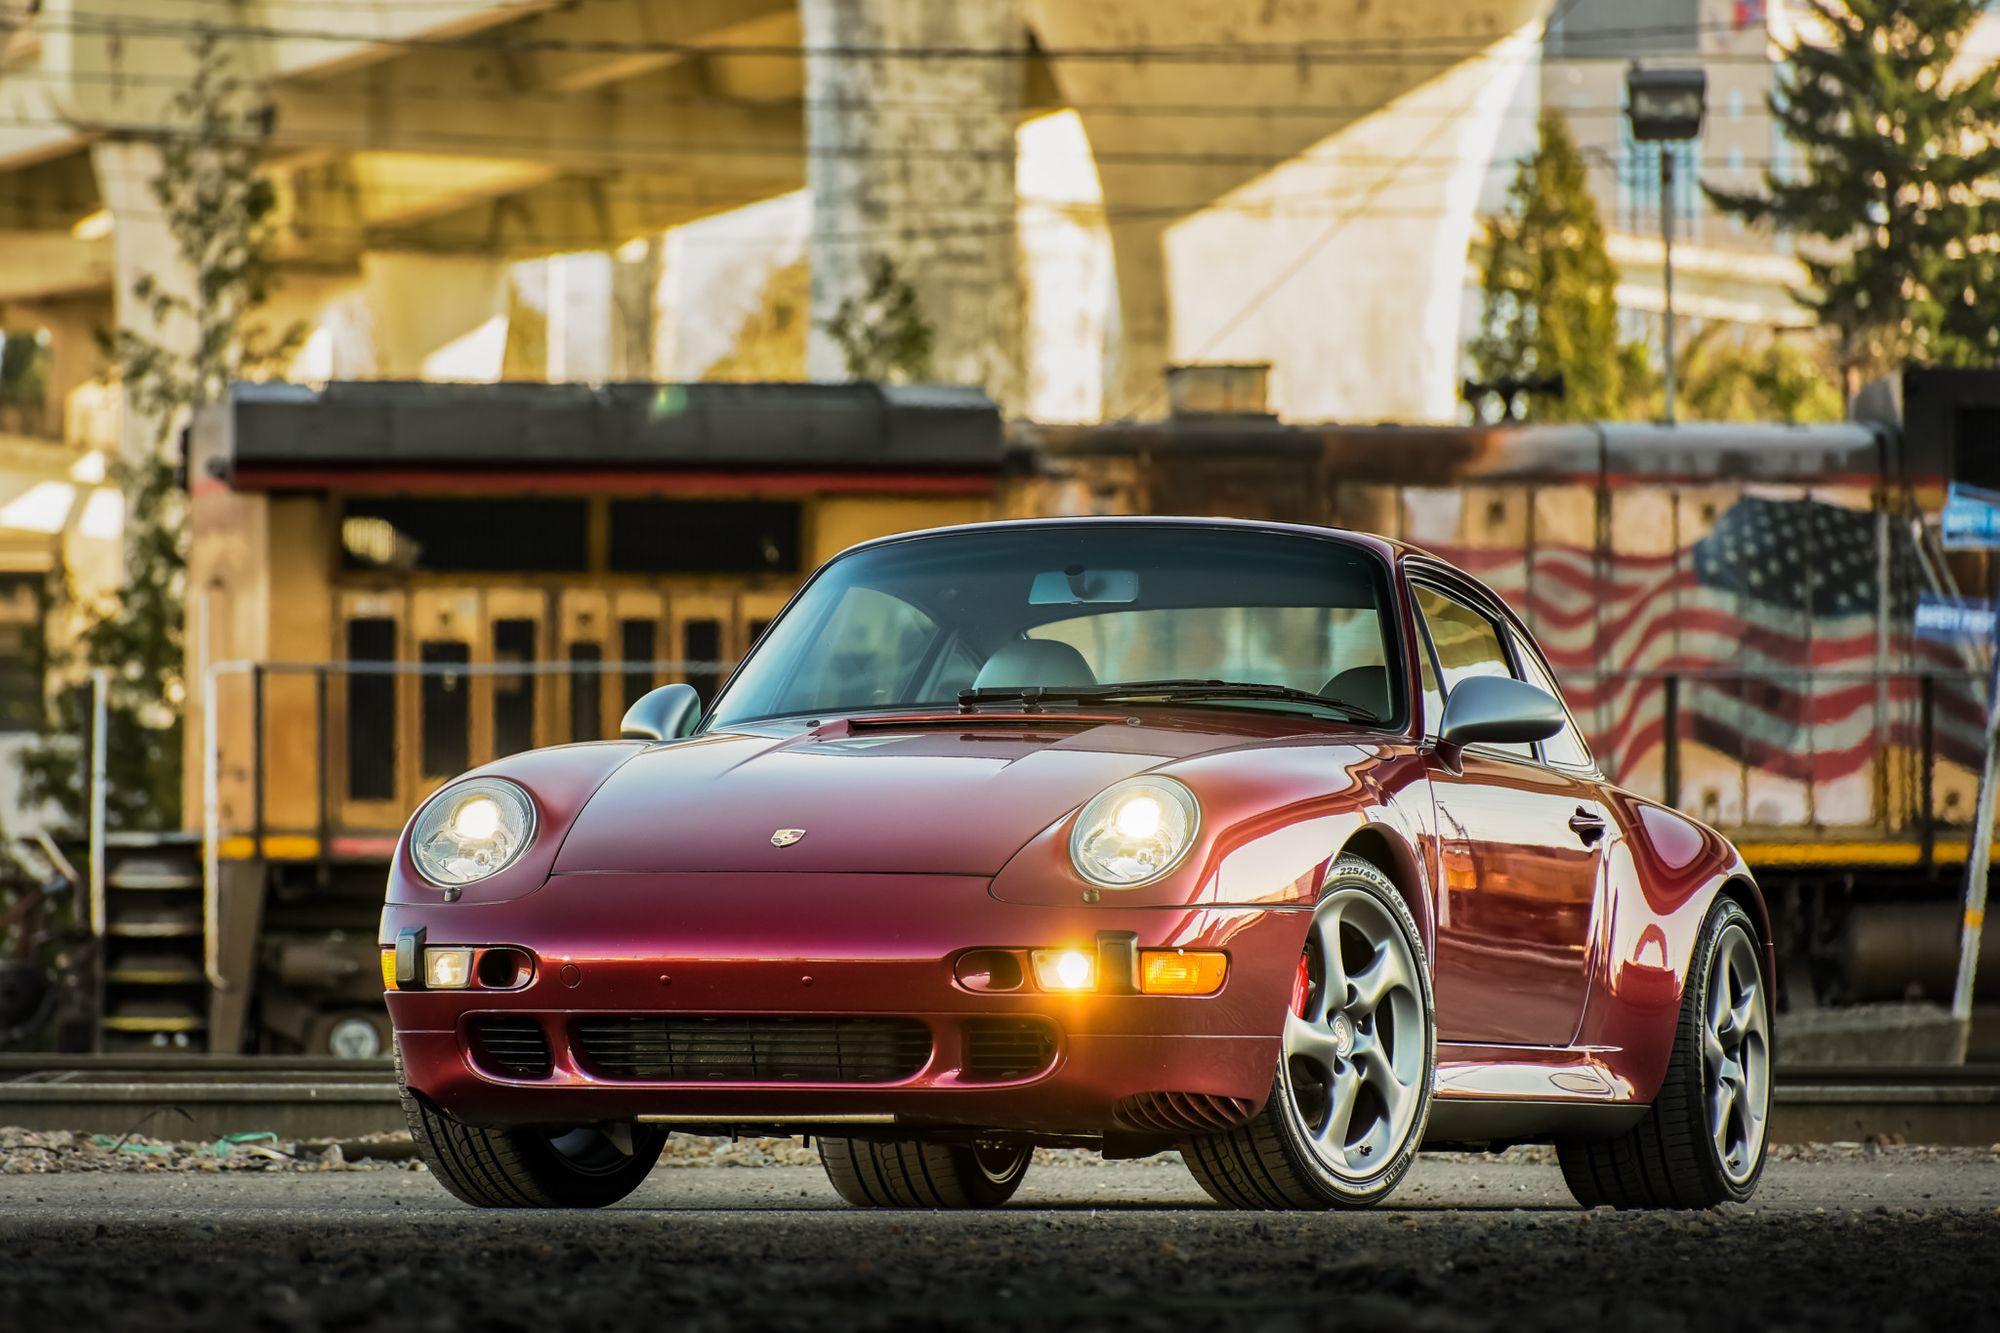 "<img src=""1997-porsche-911-carrera-4s.jpg"" alt=""The front of a 1997 Porsche 911 Carrera 4S in Arena Red Metallic"">"